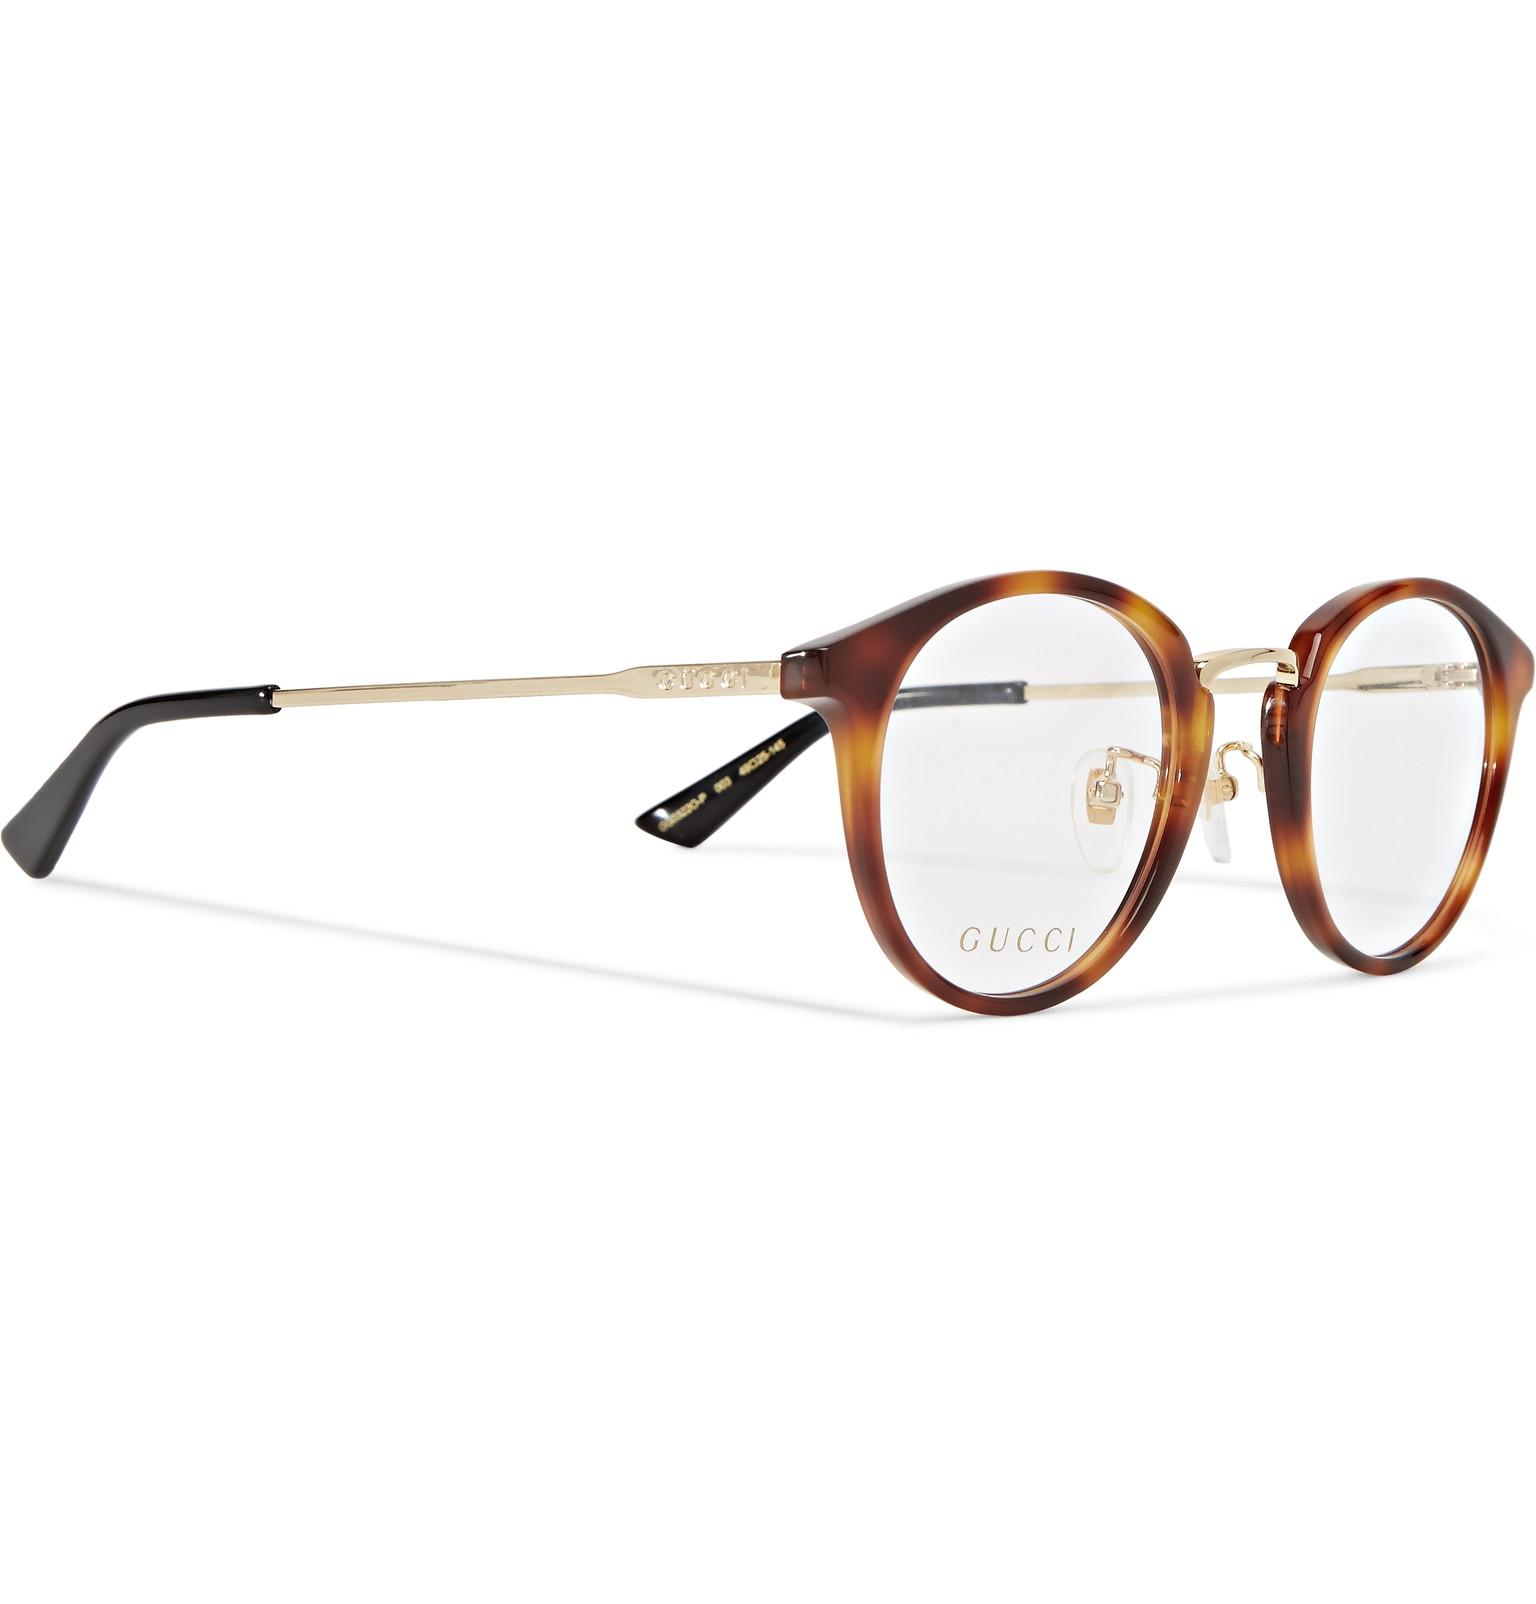 de756080eac Gucci Round-frame Tortoiseshell Acetate And Gold-tone Optical ...